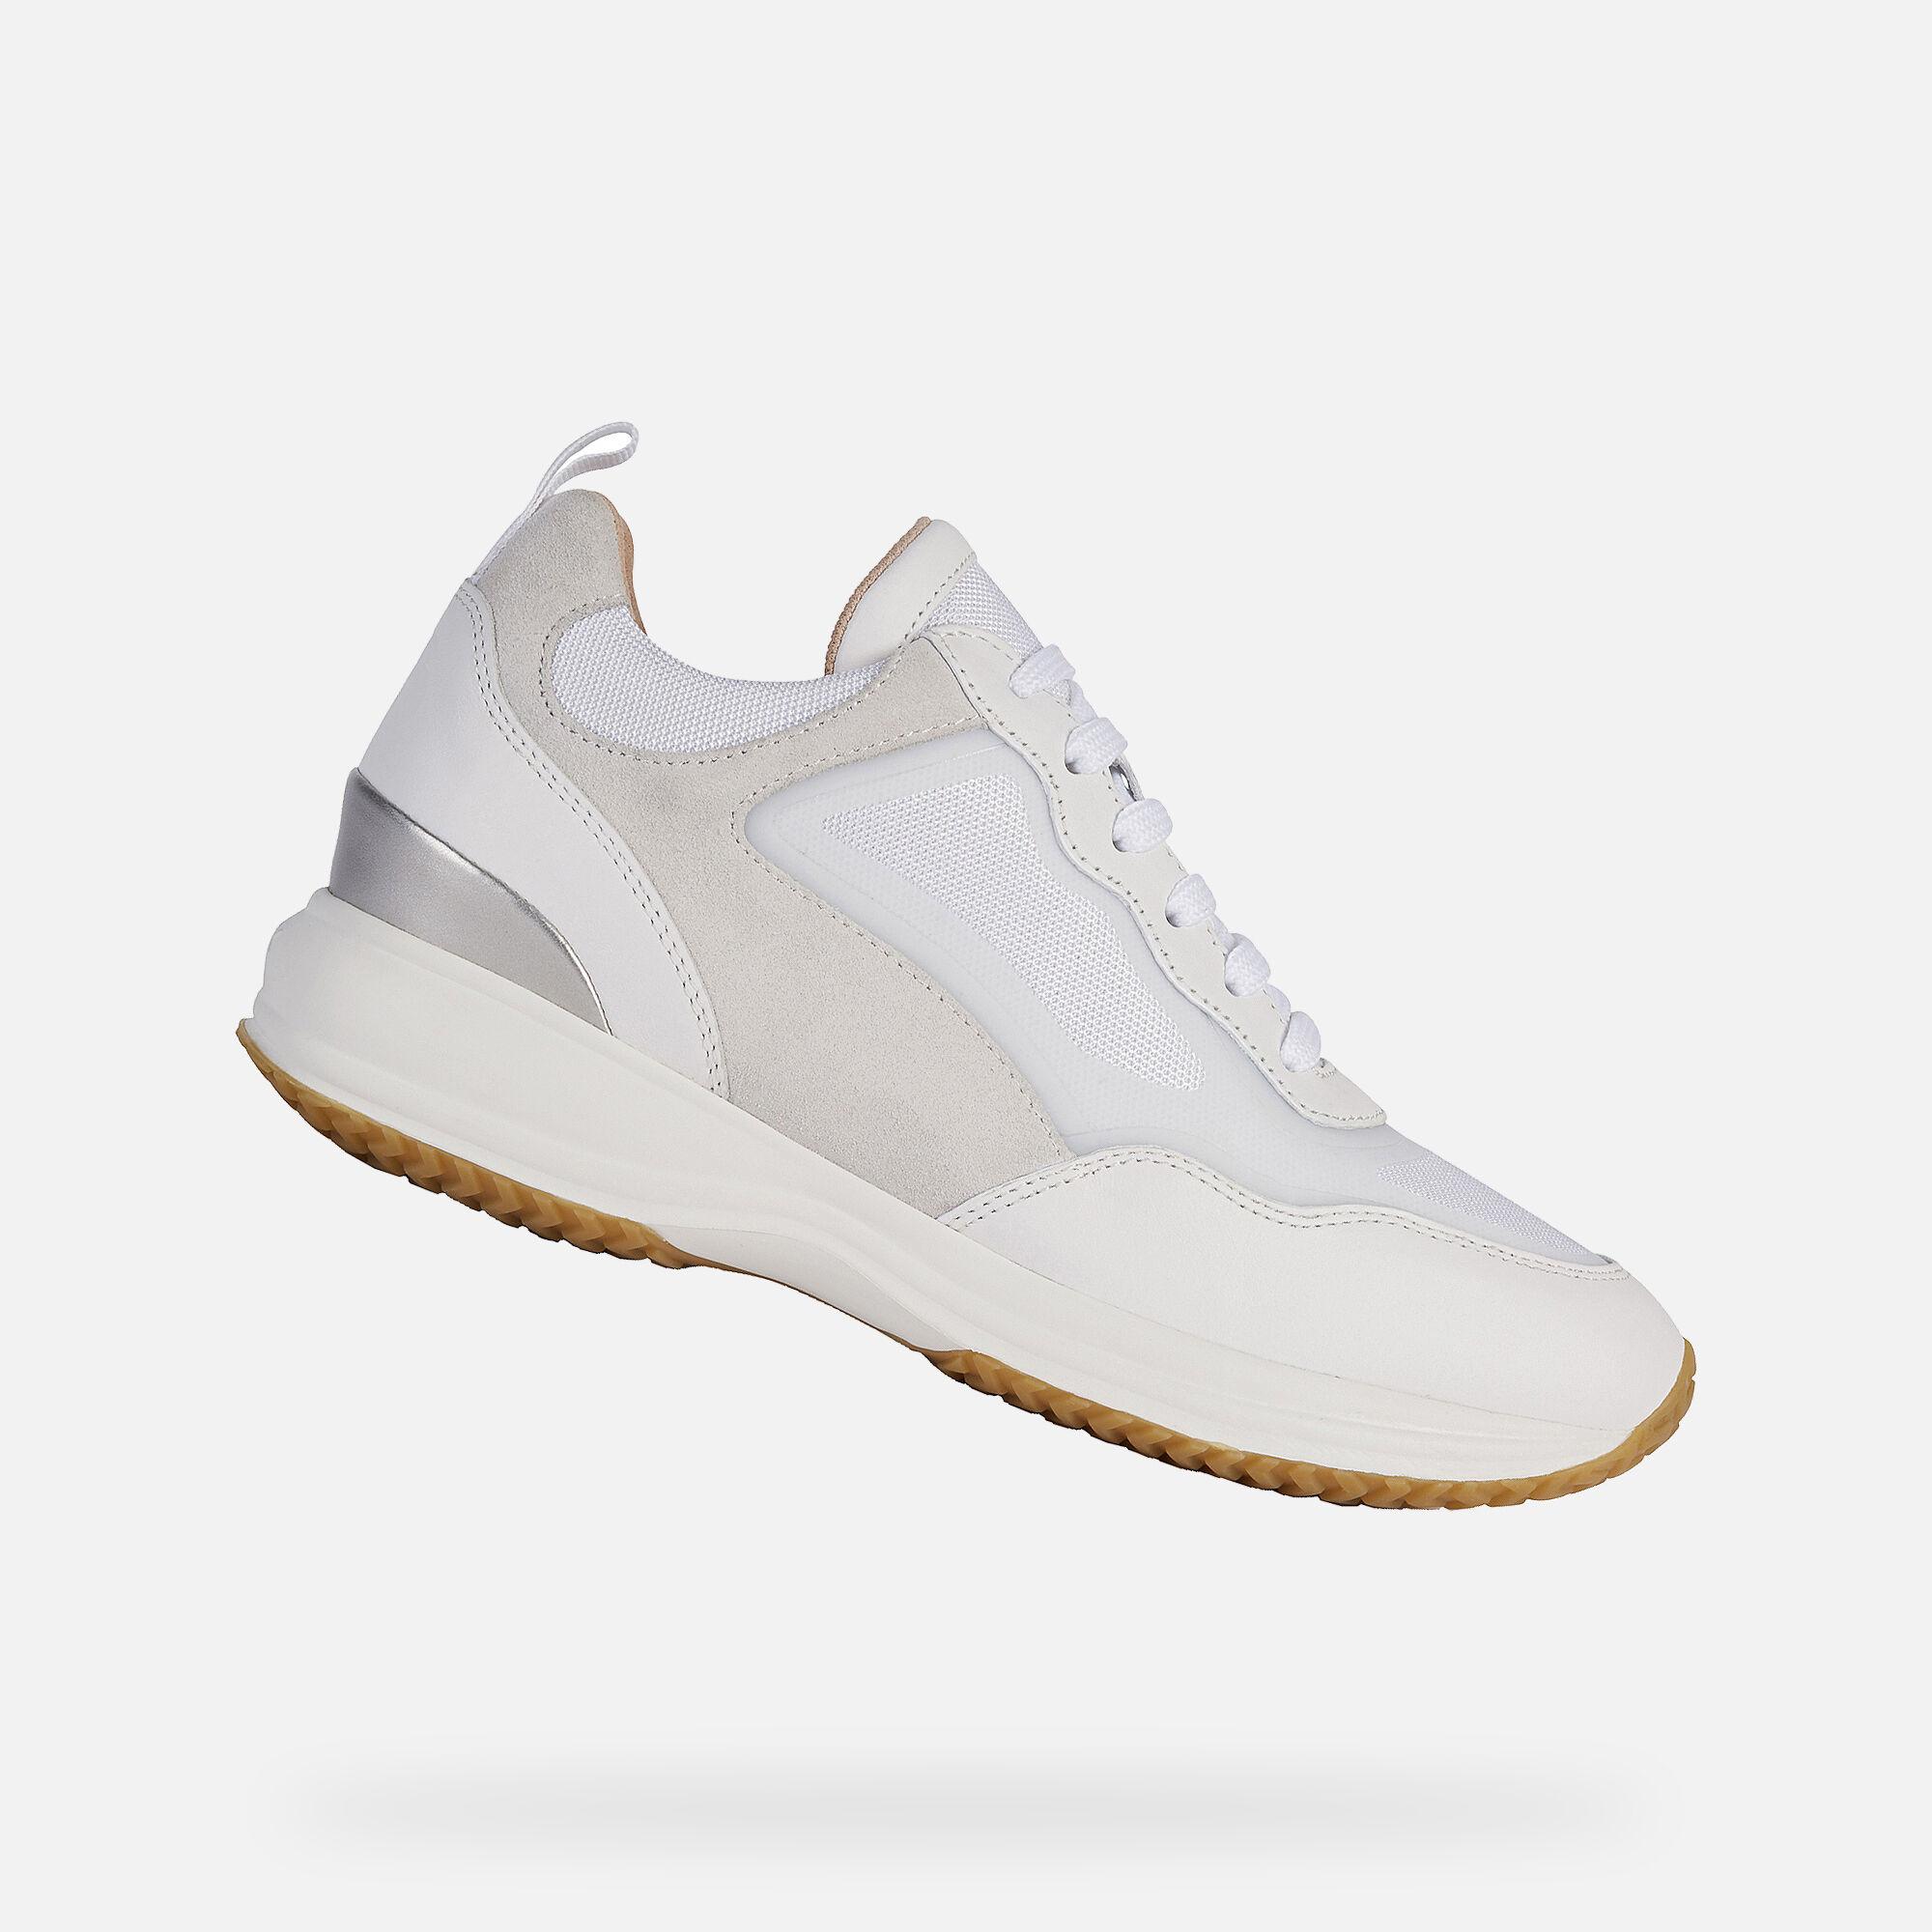 Alla Moda Sneakers Geox Happy A In Nappa Beige Donna Online :